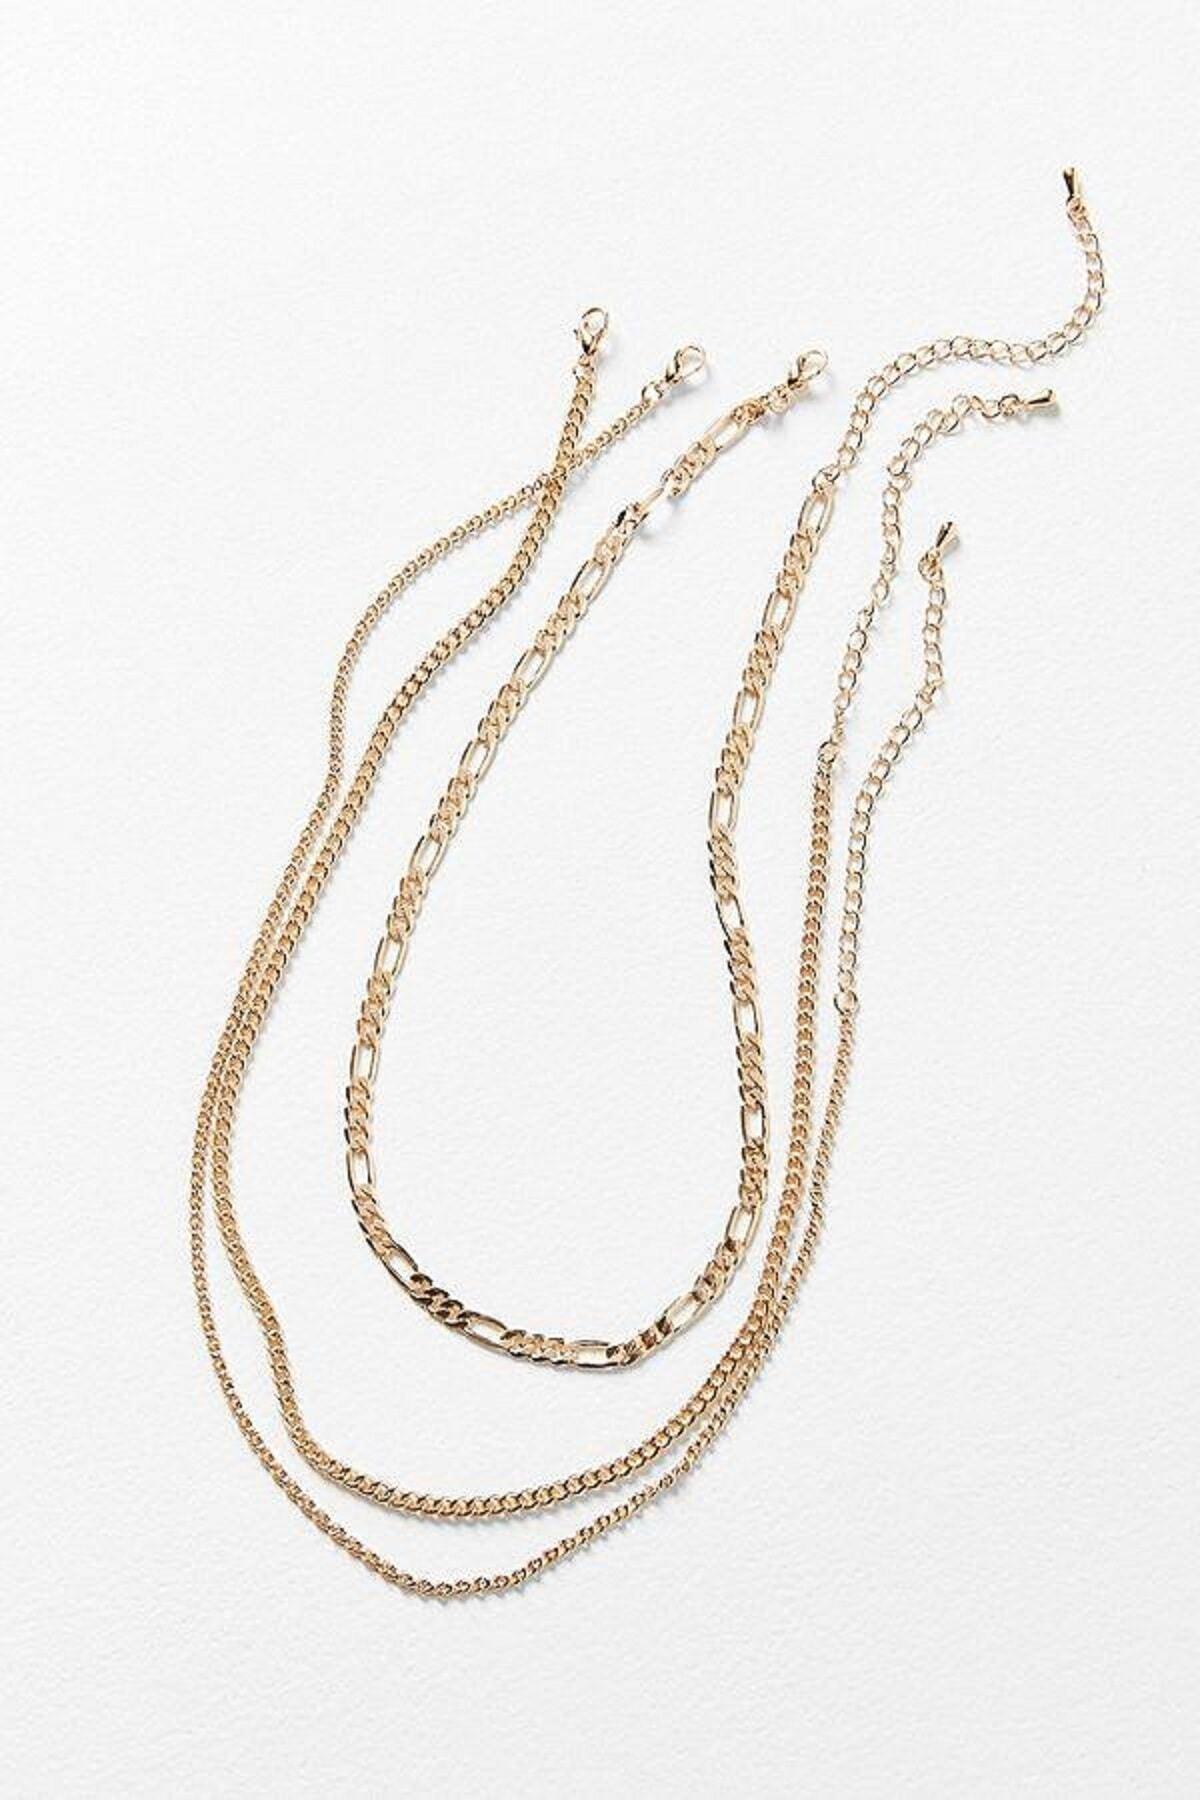 X-Lady Accessories Kadın Altın Zincir Seti 2